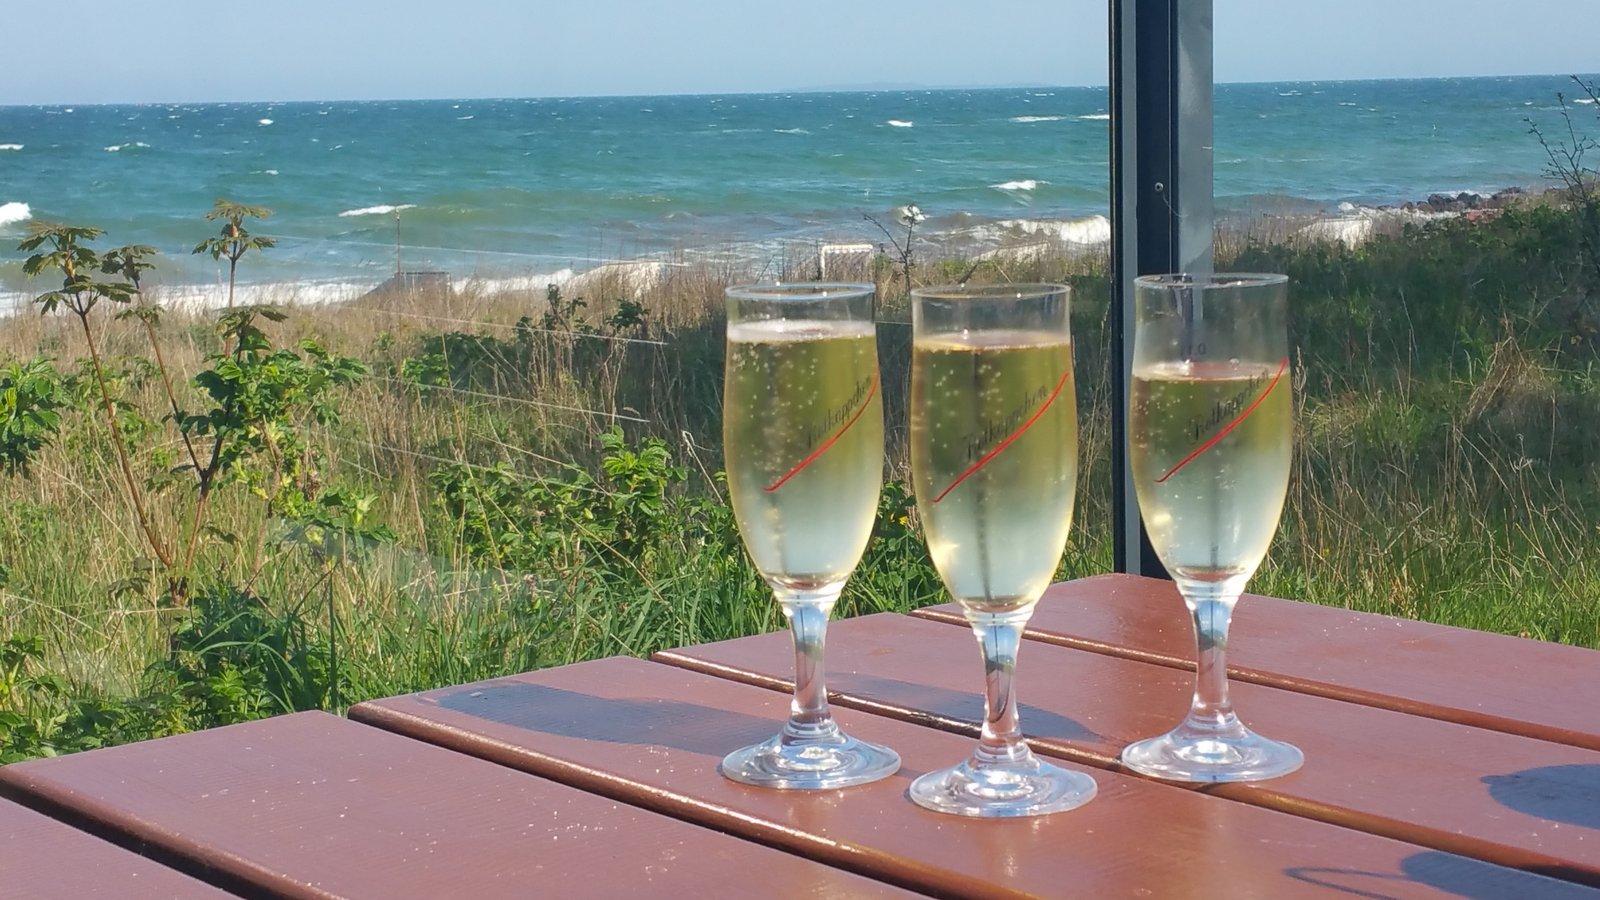 3 Gläser Sekt bei Udo